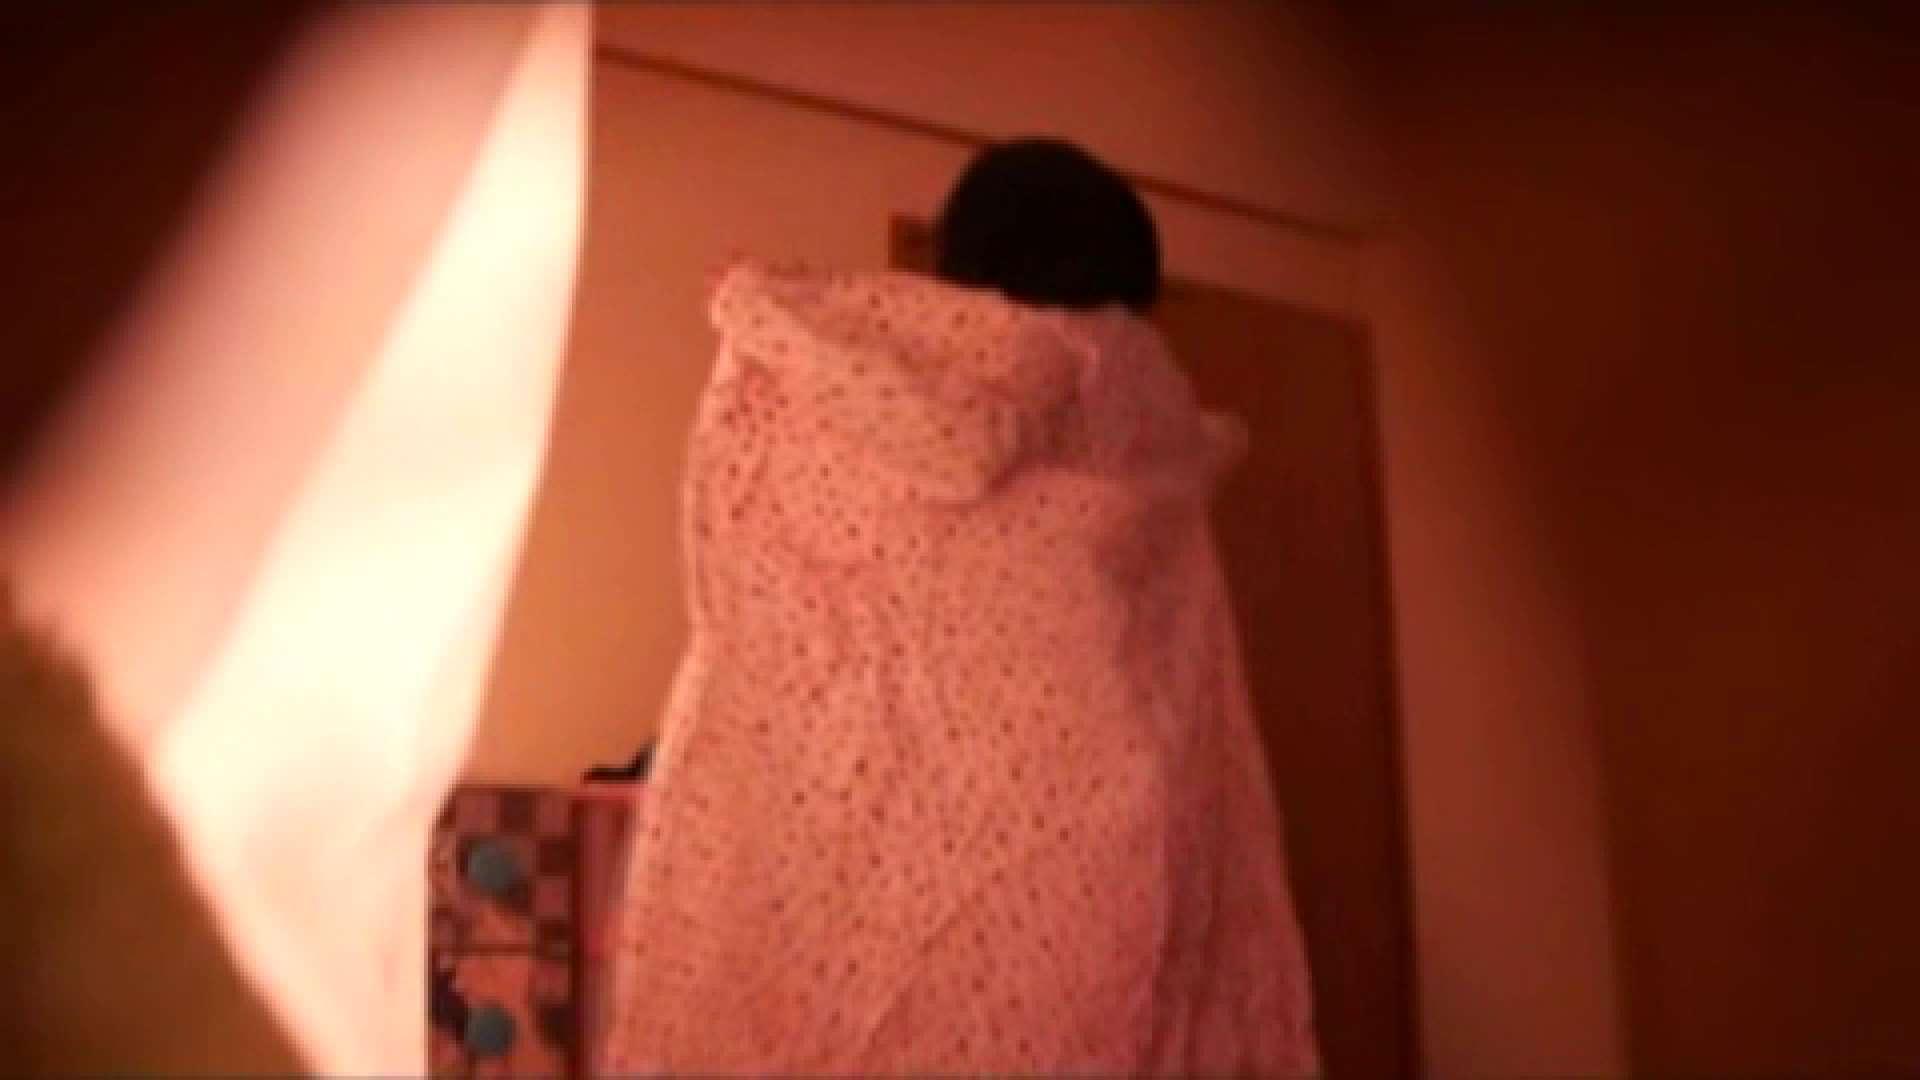 vol.2 まりこさんのお着替え、就寝前の映像です。 エッチすぎるOL達 | 着替えシーン  29連発 9